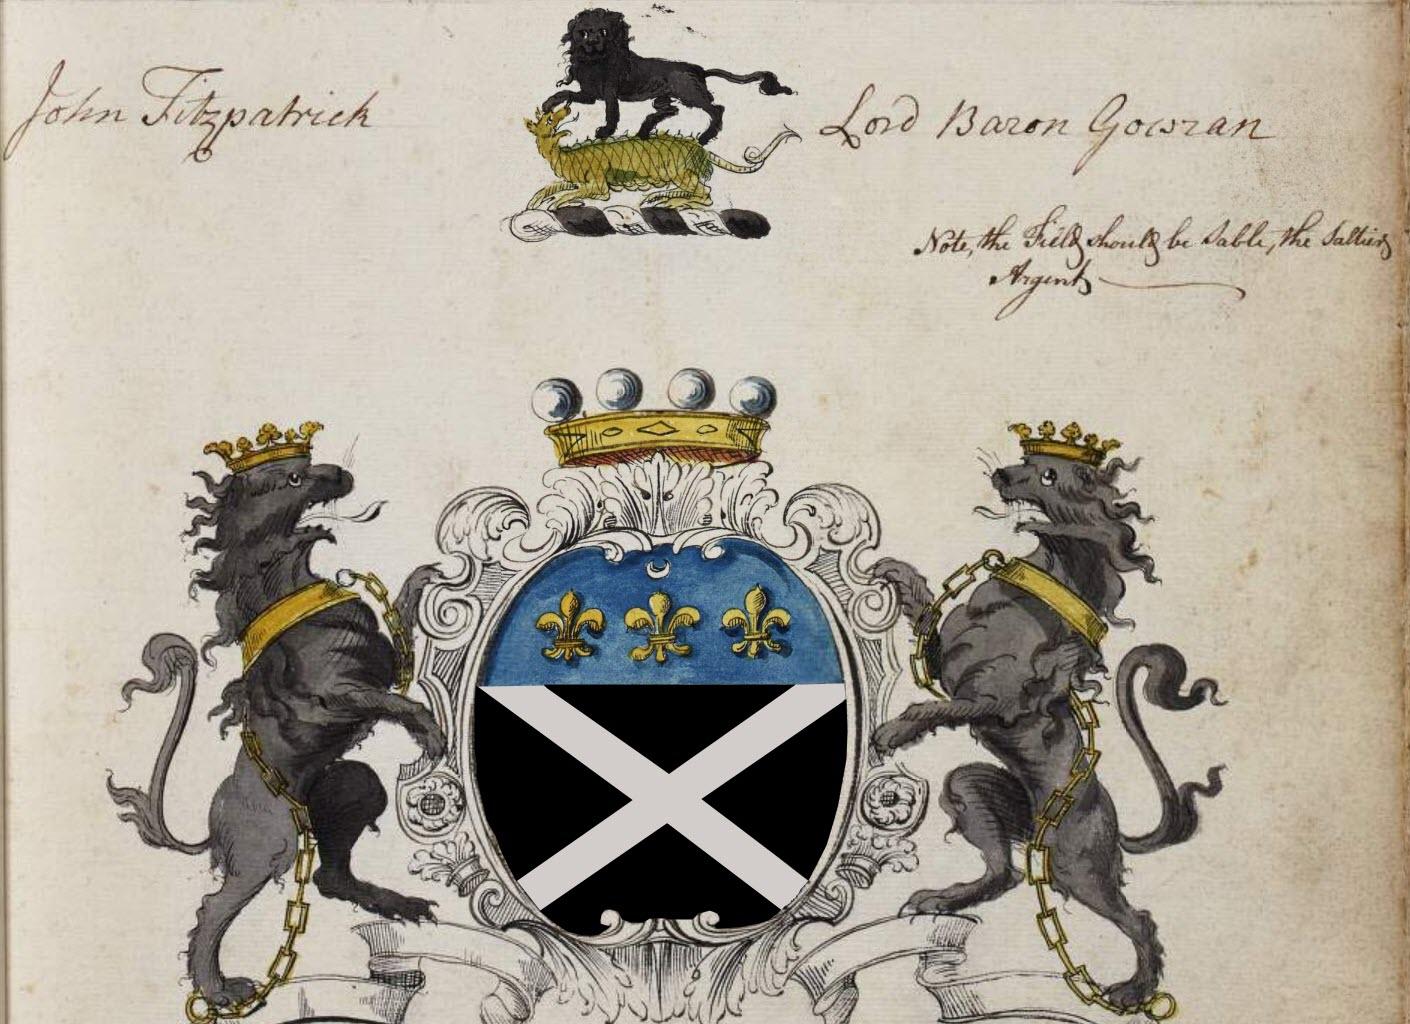 John Fitzpatrick, 2nd Lord Baron Gowran, 1st Earl Upper Ossory